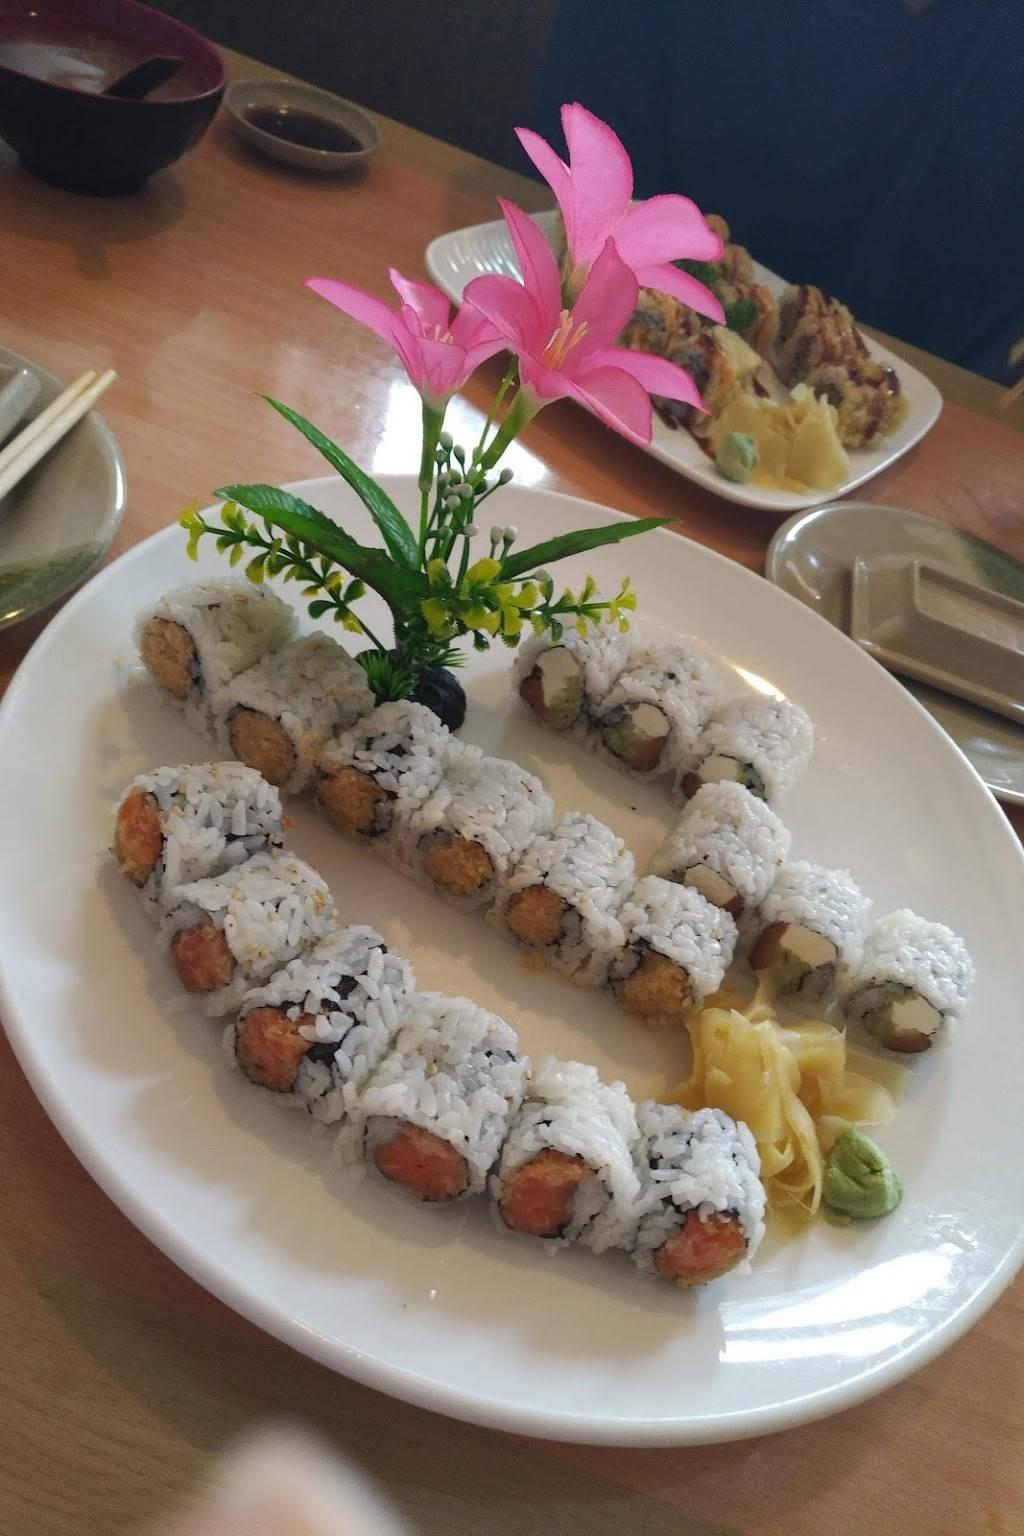 Tokyo House | restaurant | 106 West St, Rutland, VT 05701, USA | 8027868080 OR +1 802-786-8080